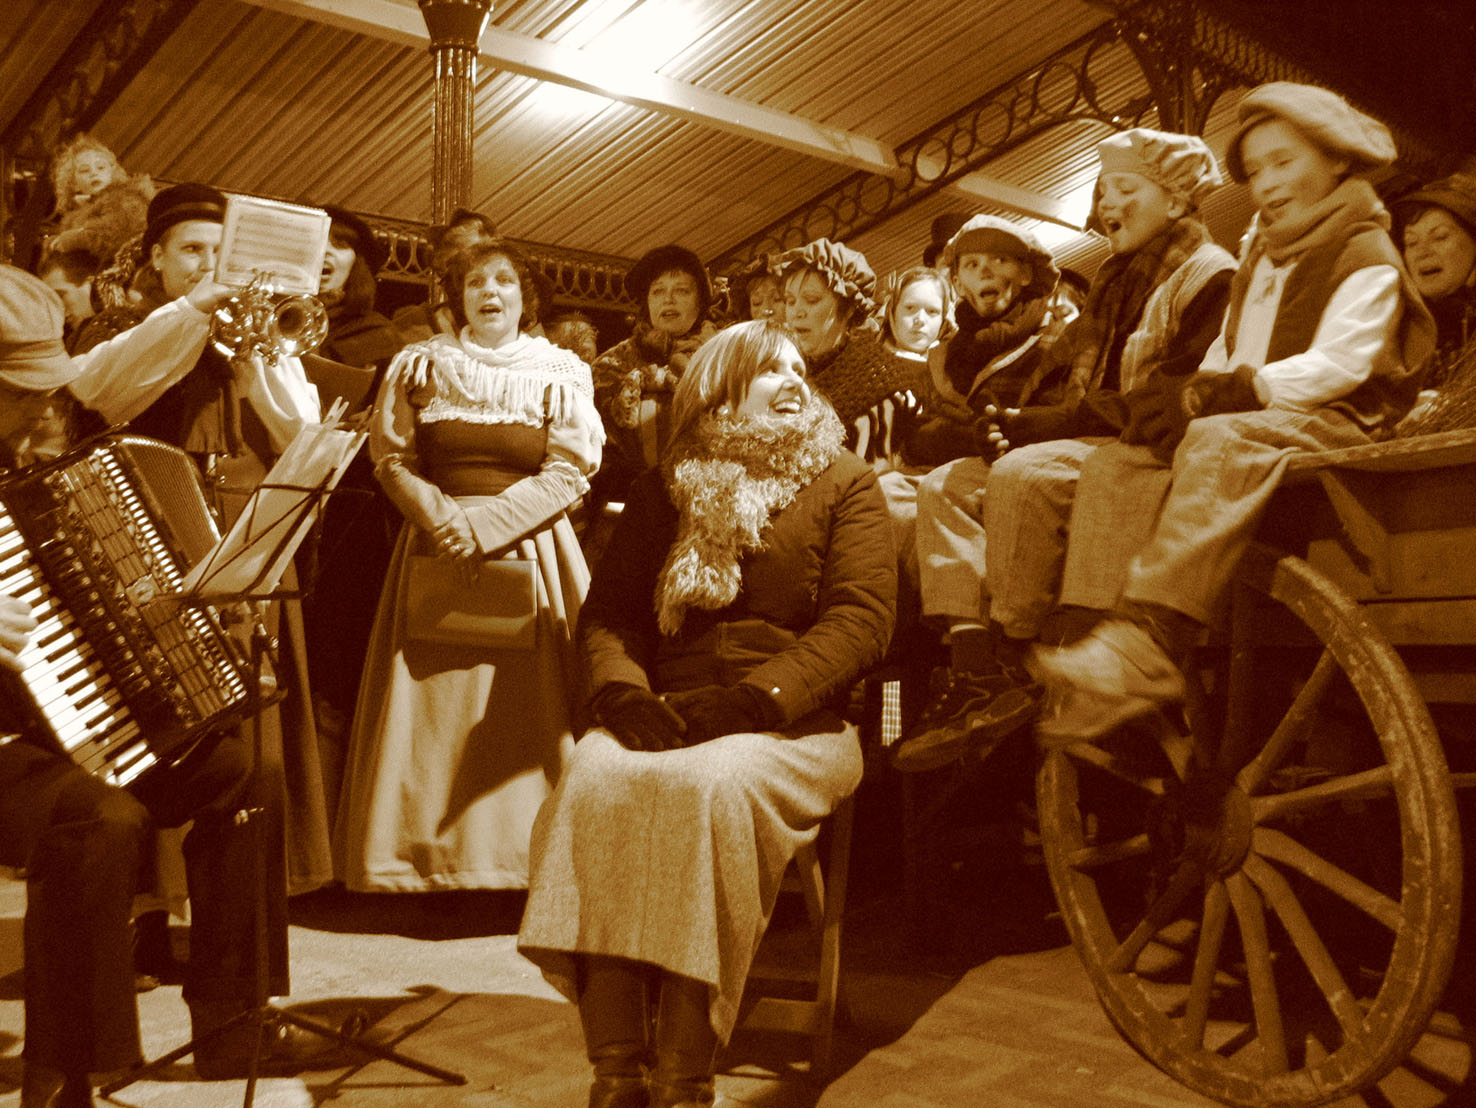 118 - Kerstmarkt Helmond 2003.jpg